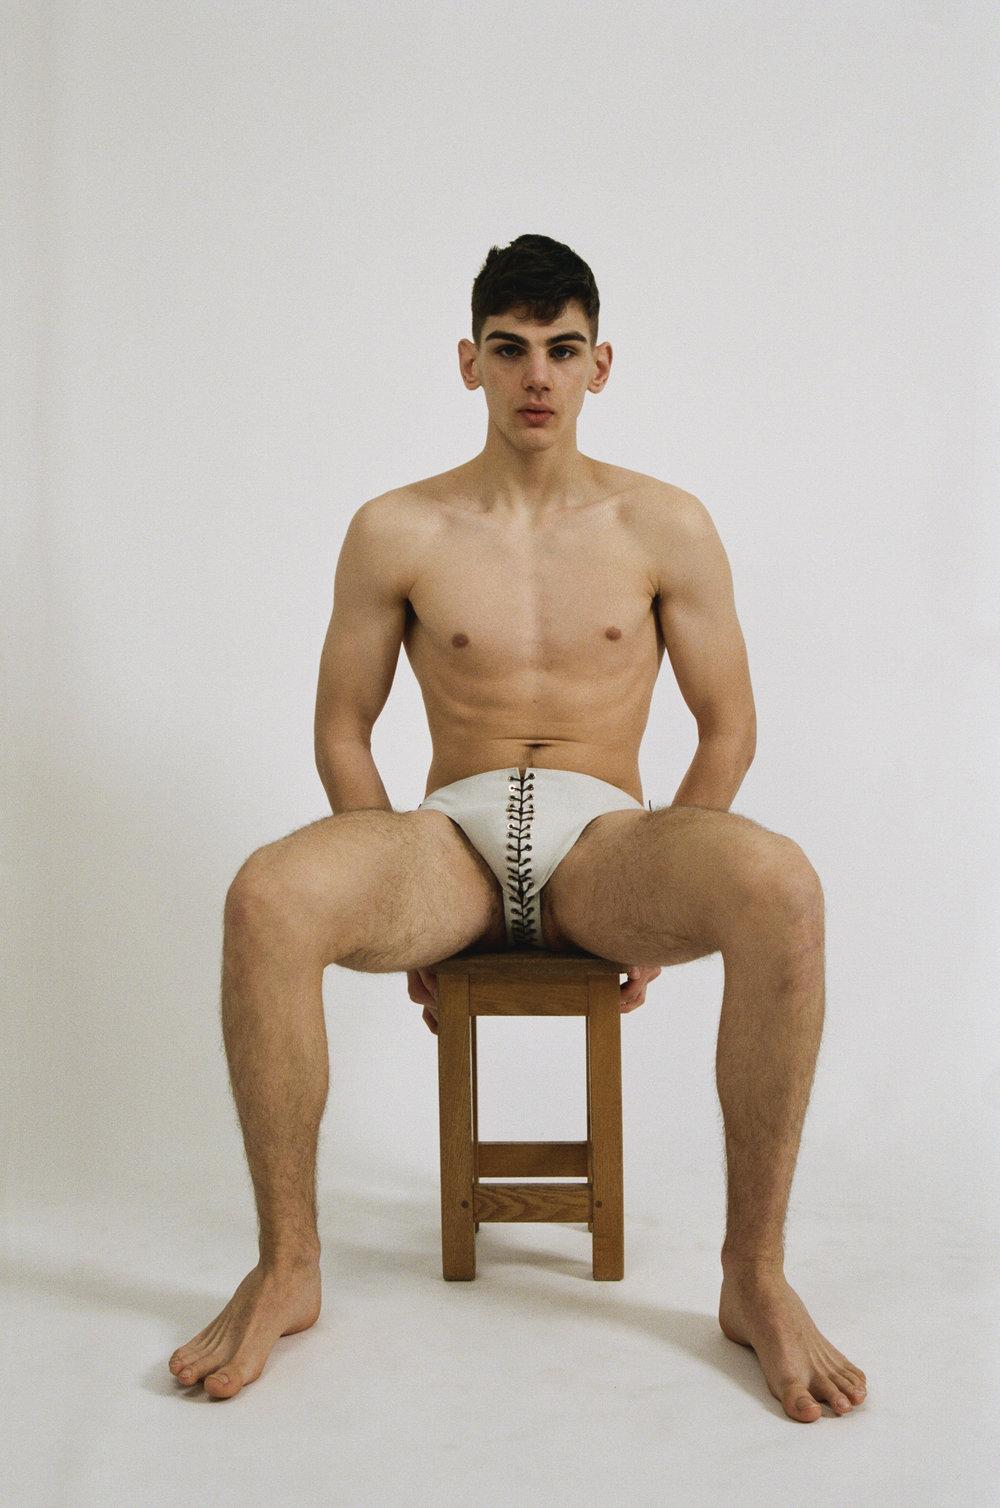 Fabien-Kruszelnicki-Ludovic-de-Saint-Sernin-Ansinth_Page_07_Image_0001.jpg